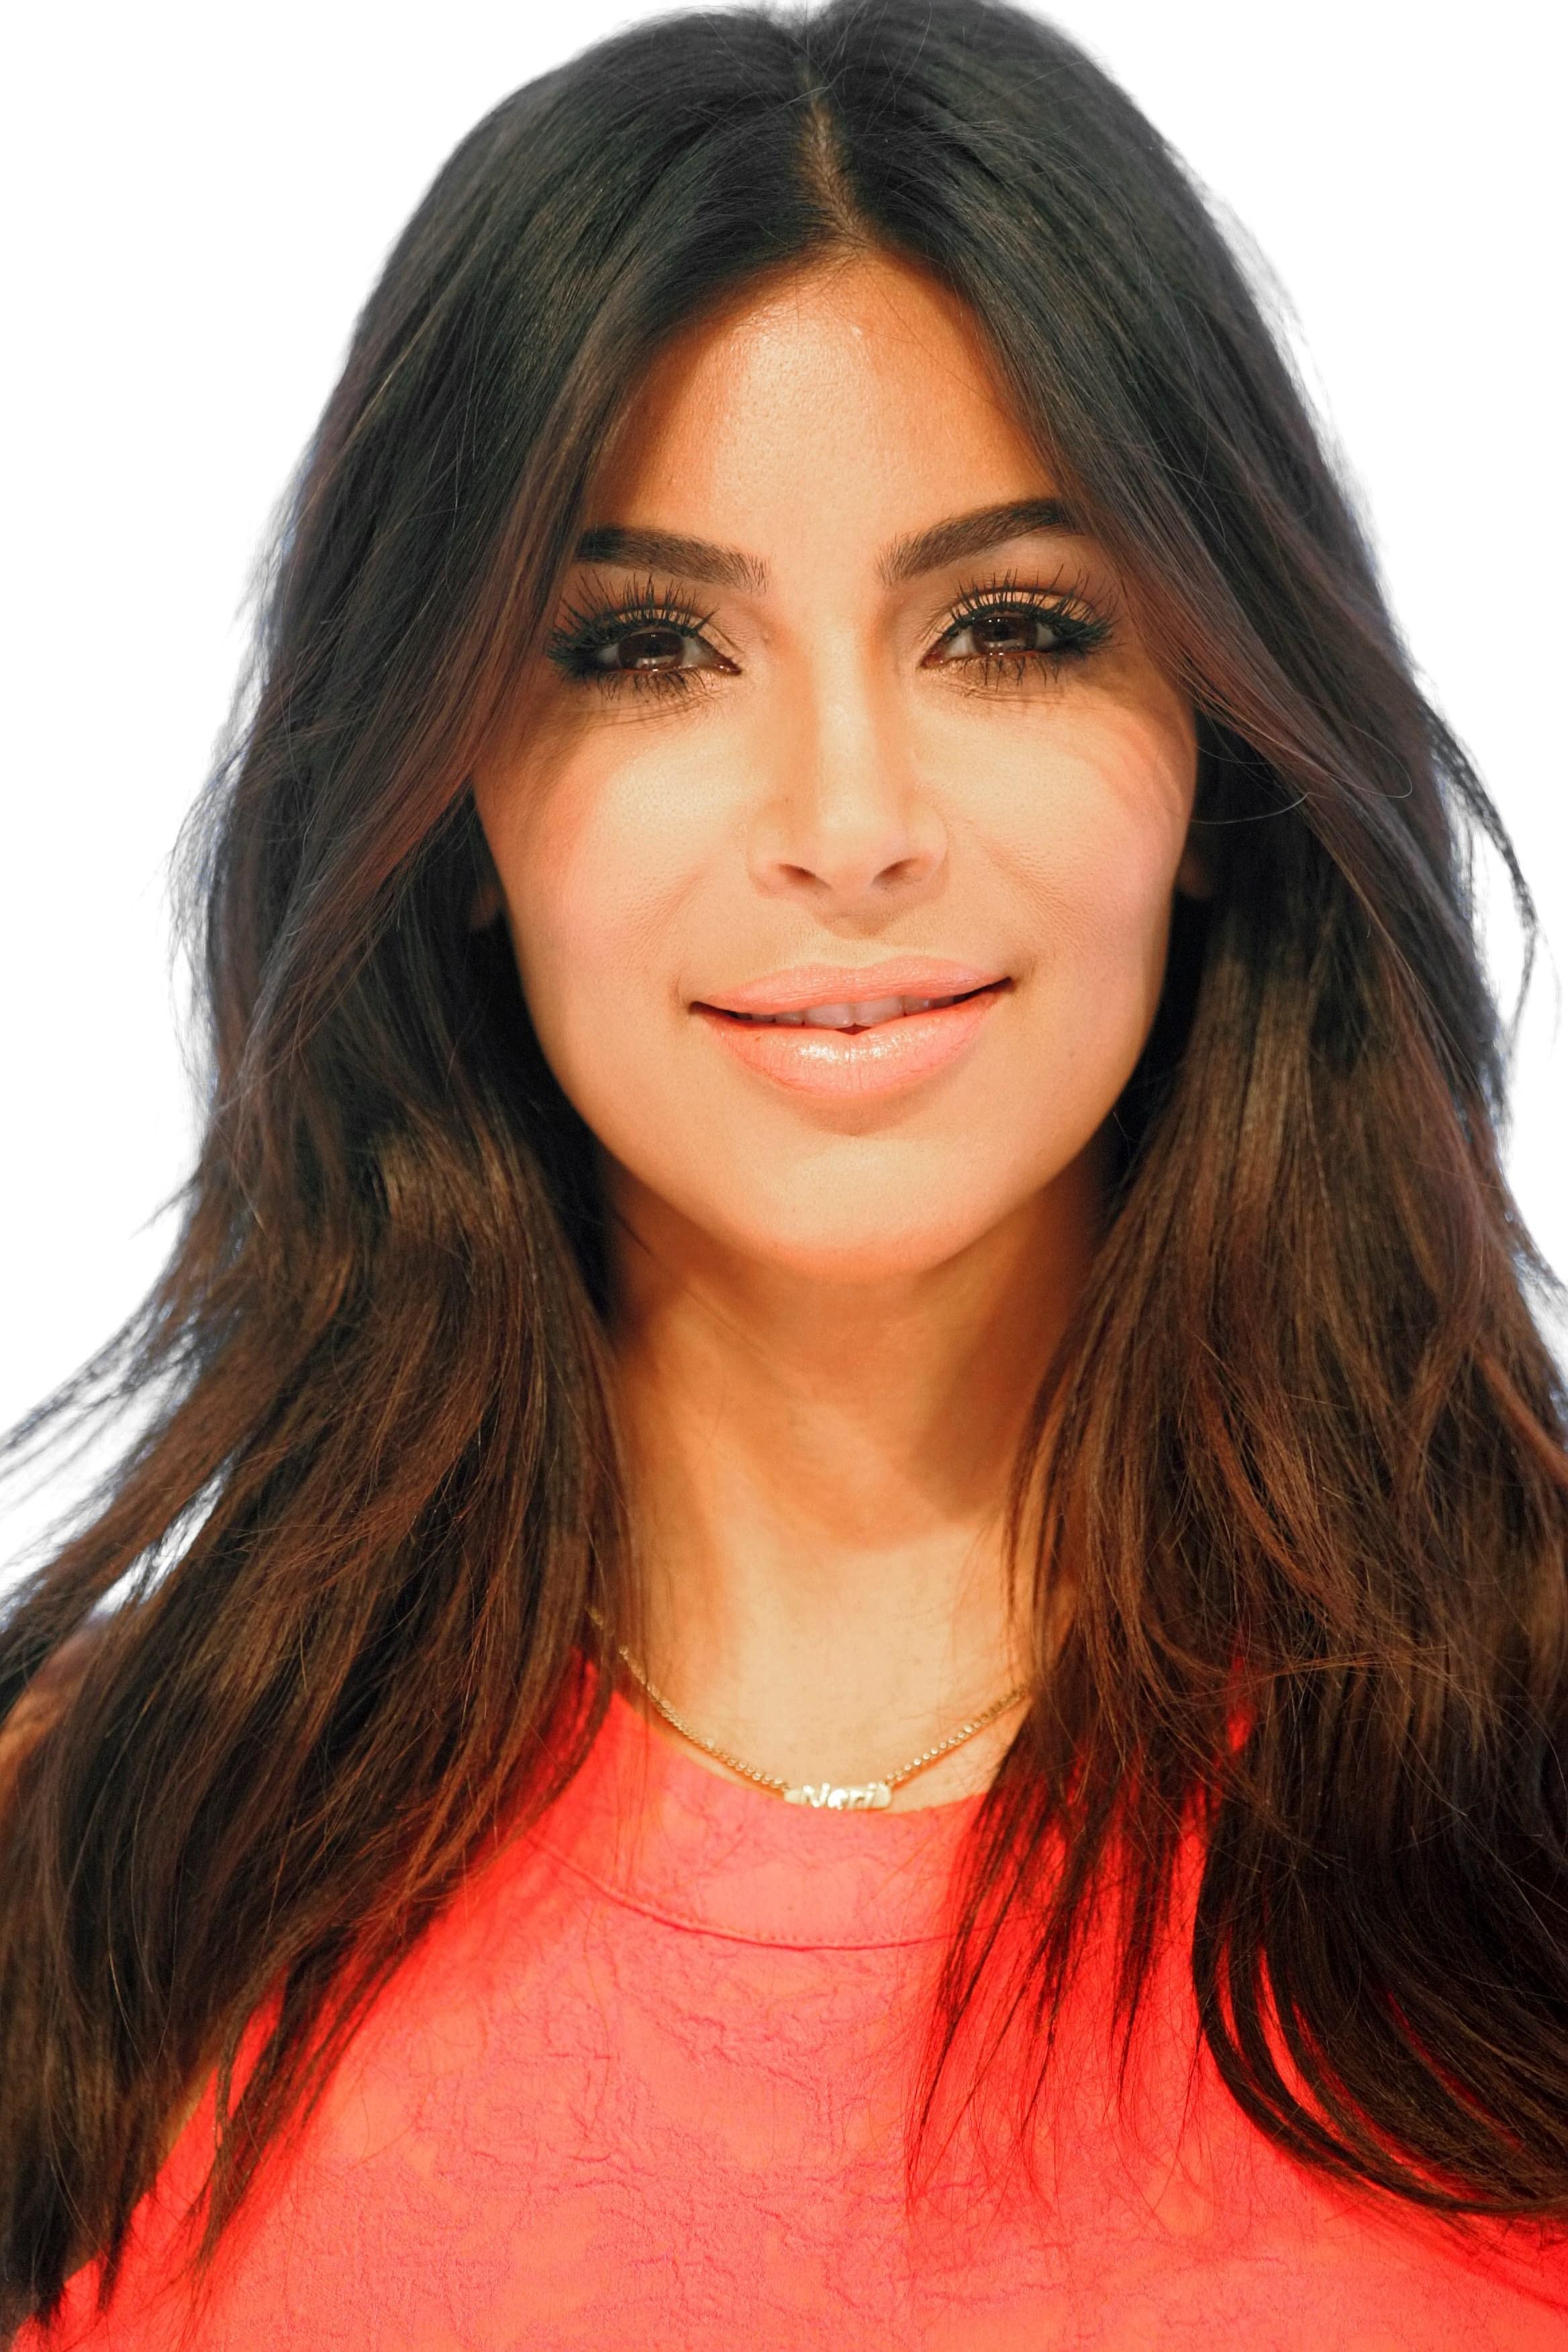 Kim Kardashian West nudes (63 fotos), pictures Fappening, Instagram, legs 2020